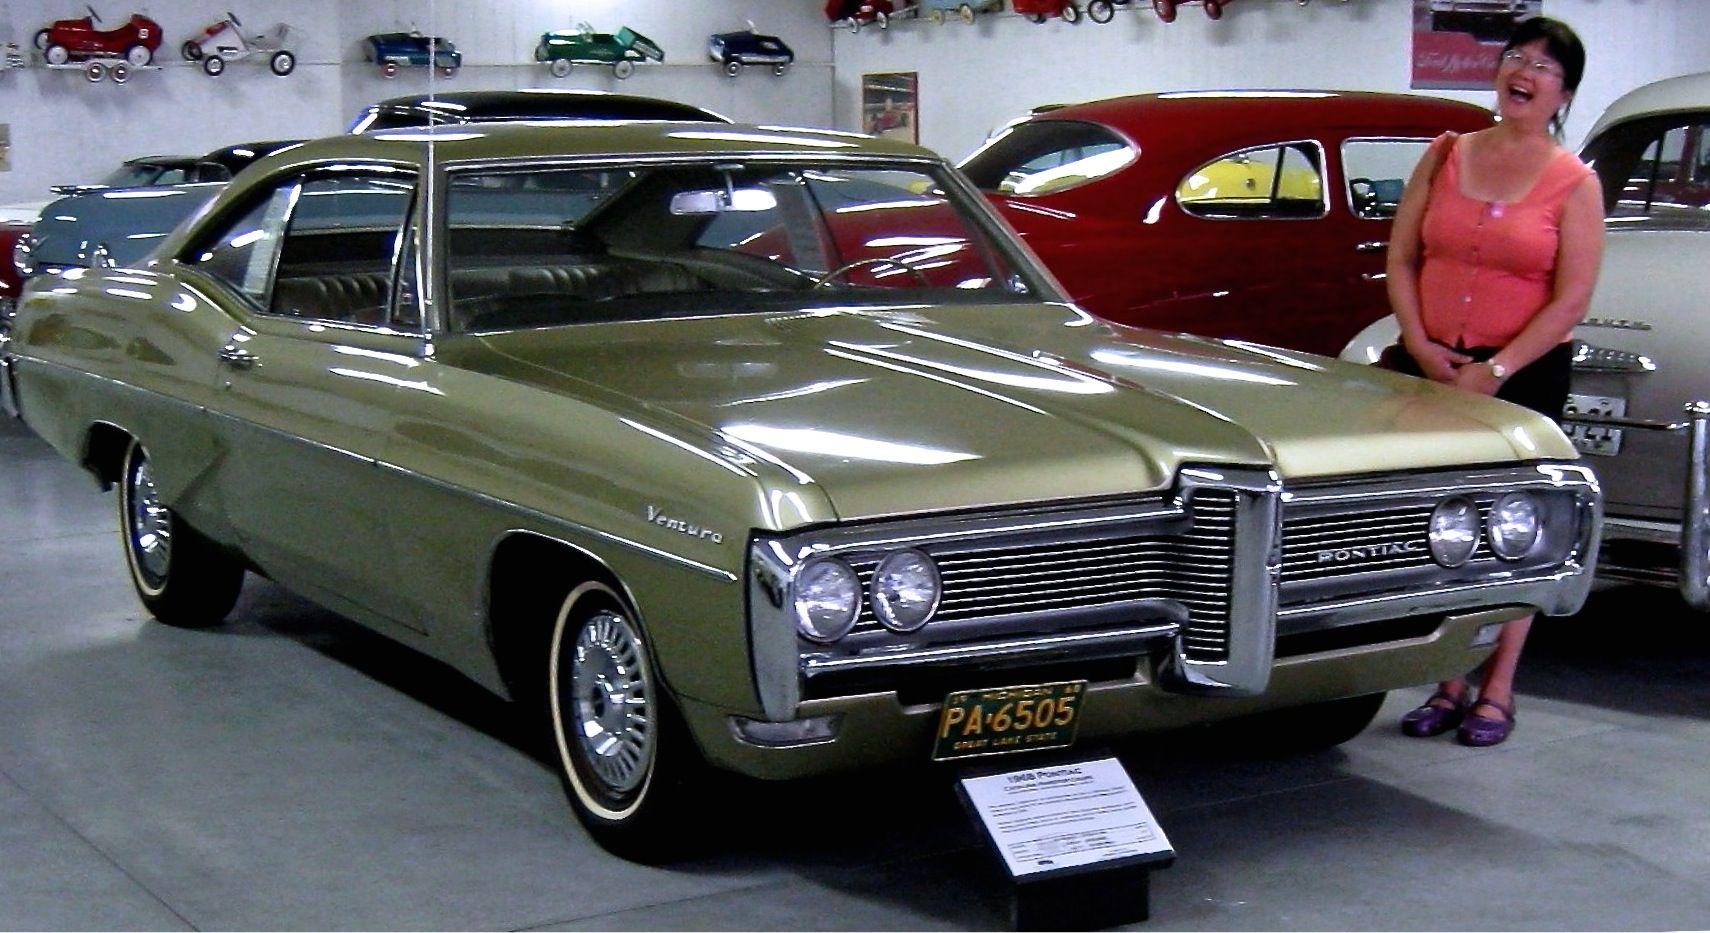 1968 Pontiac Ventura In Verdoro Green My Wife Was Thrilled To